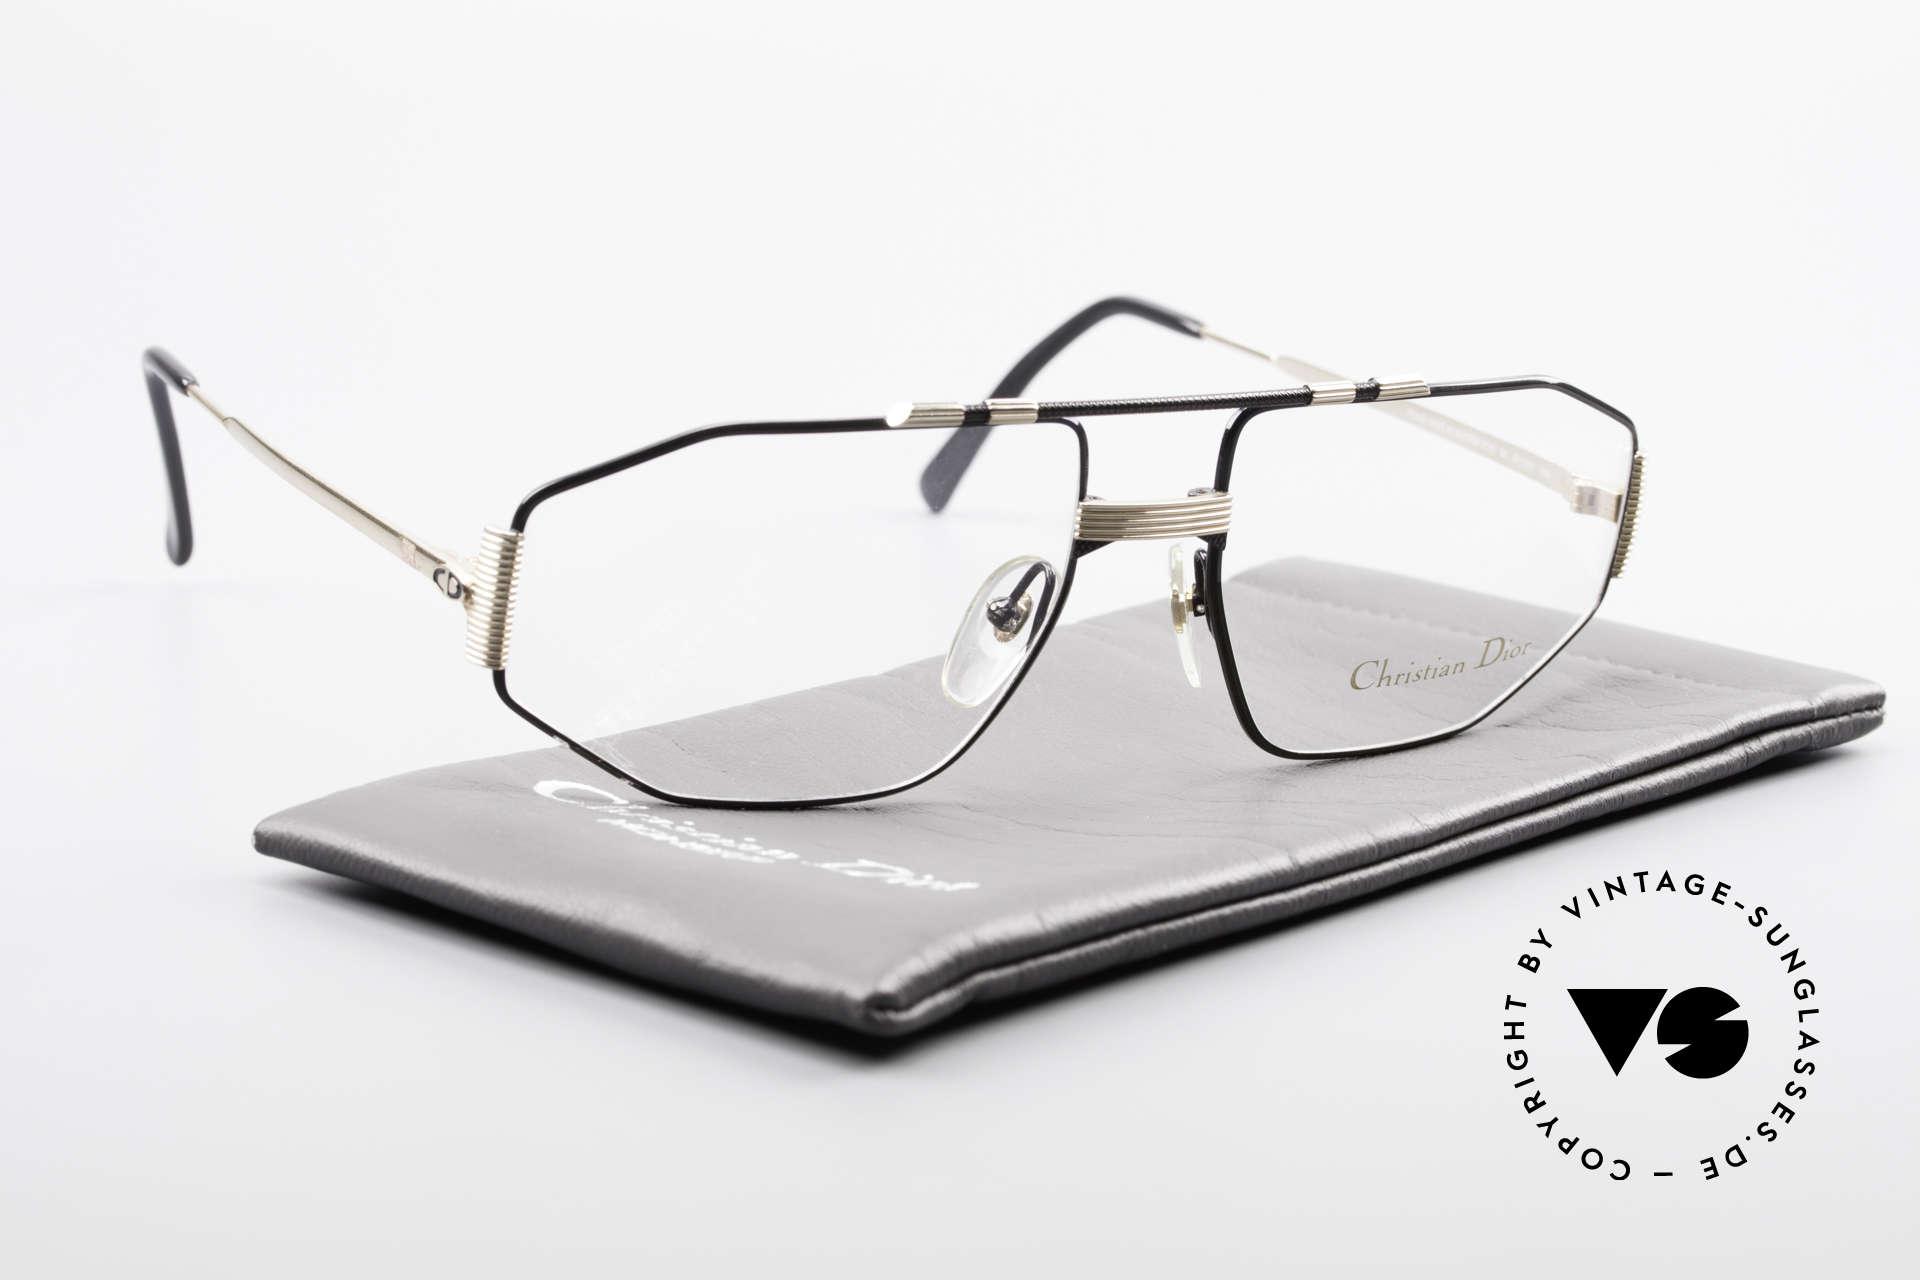 Christian Dior 2516 80's Gold Plated Vintage Frame, the frame fits lenses of any kind (prescriptions / sun), Made for Men